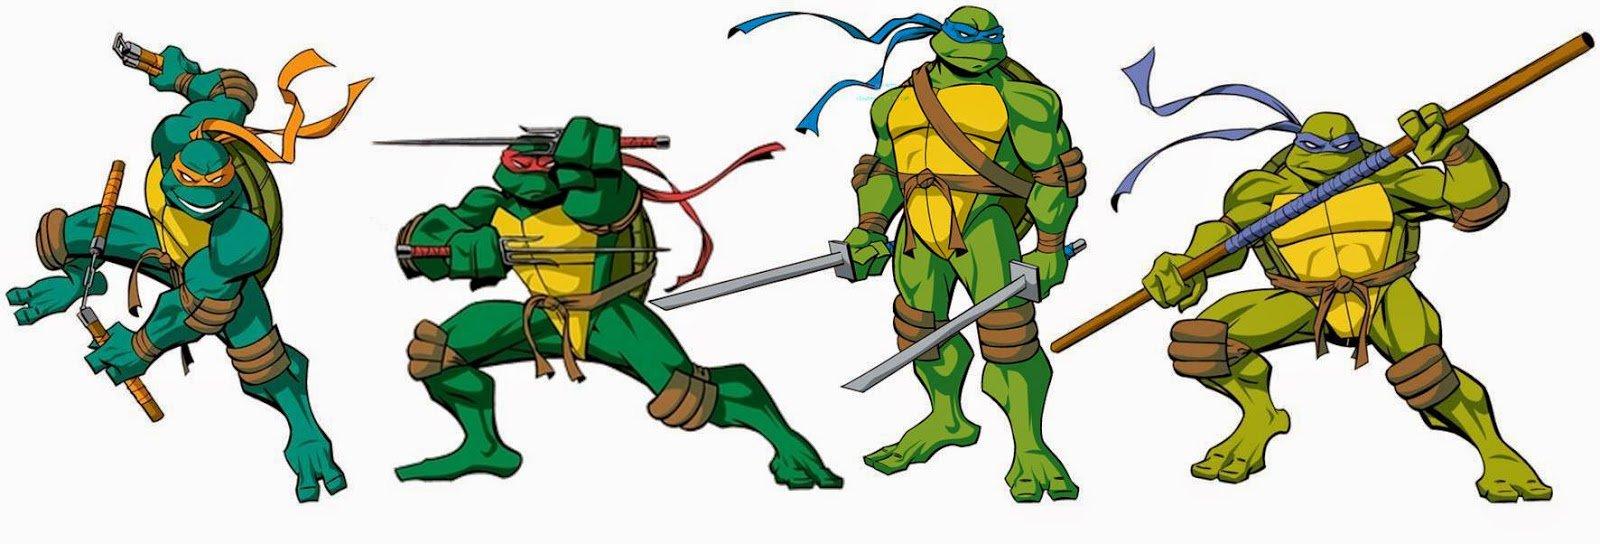 Tartarugas Ninjas Personagens Related Keywords